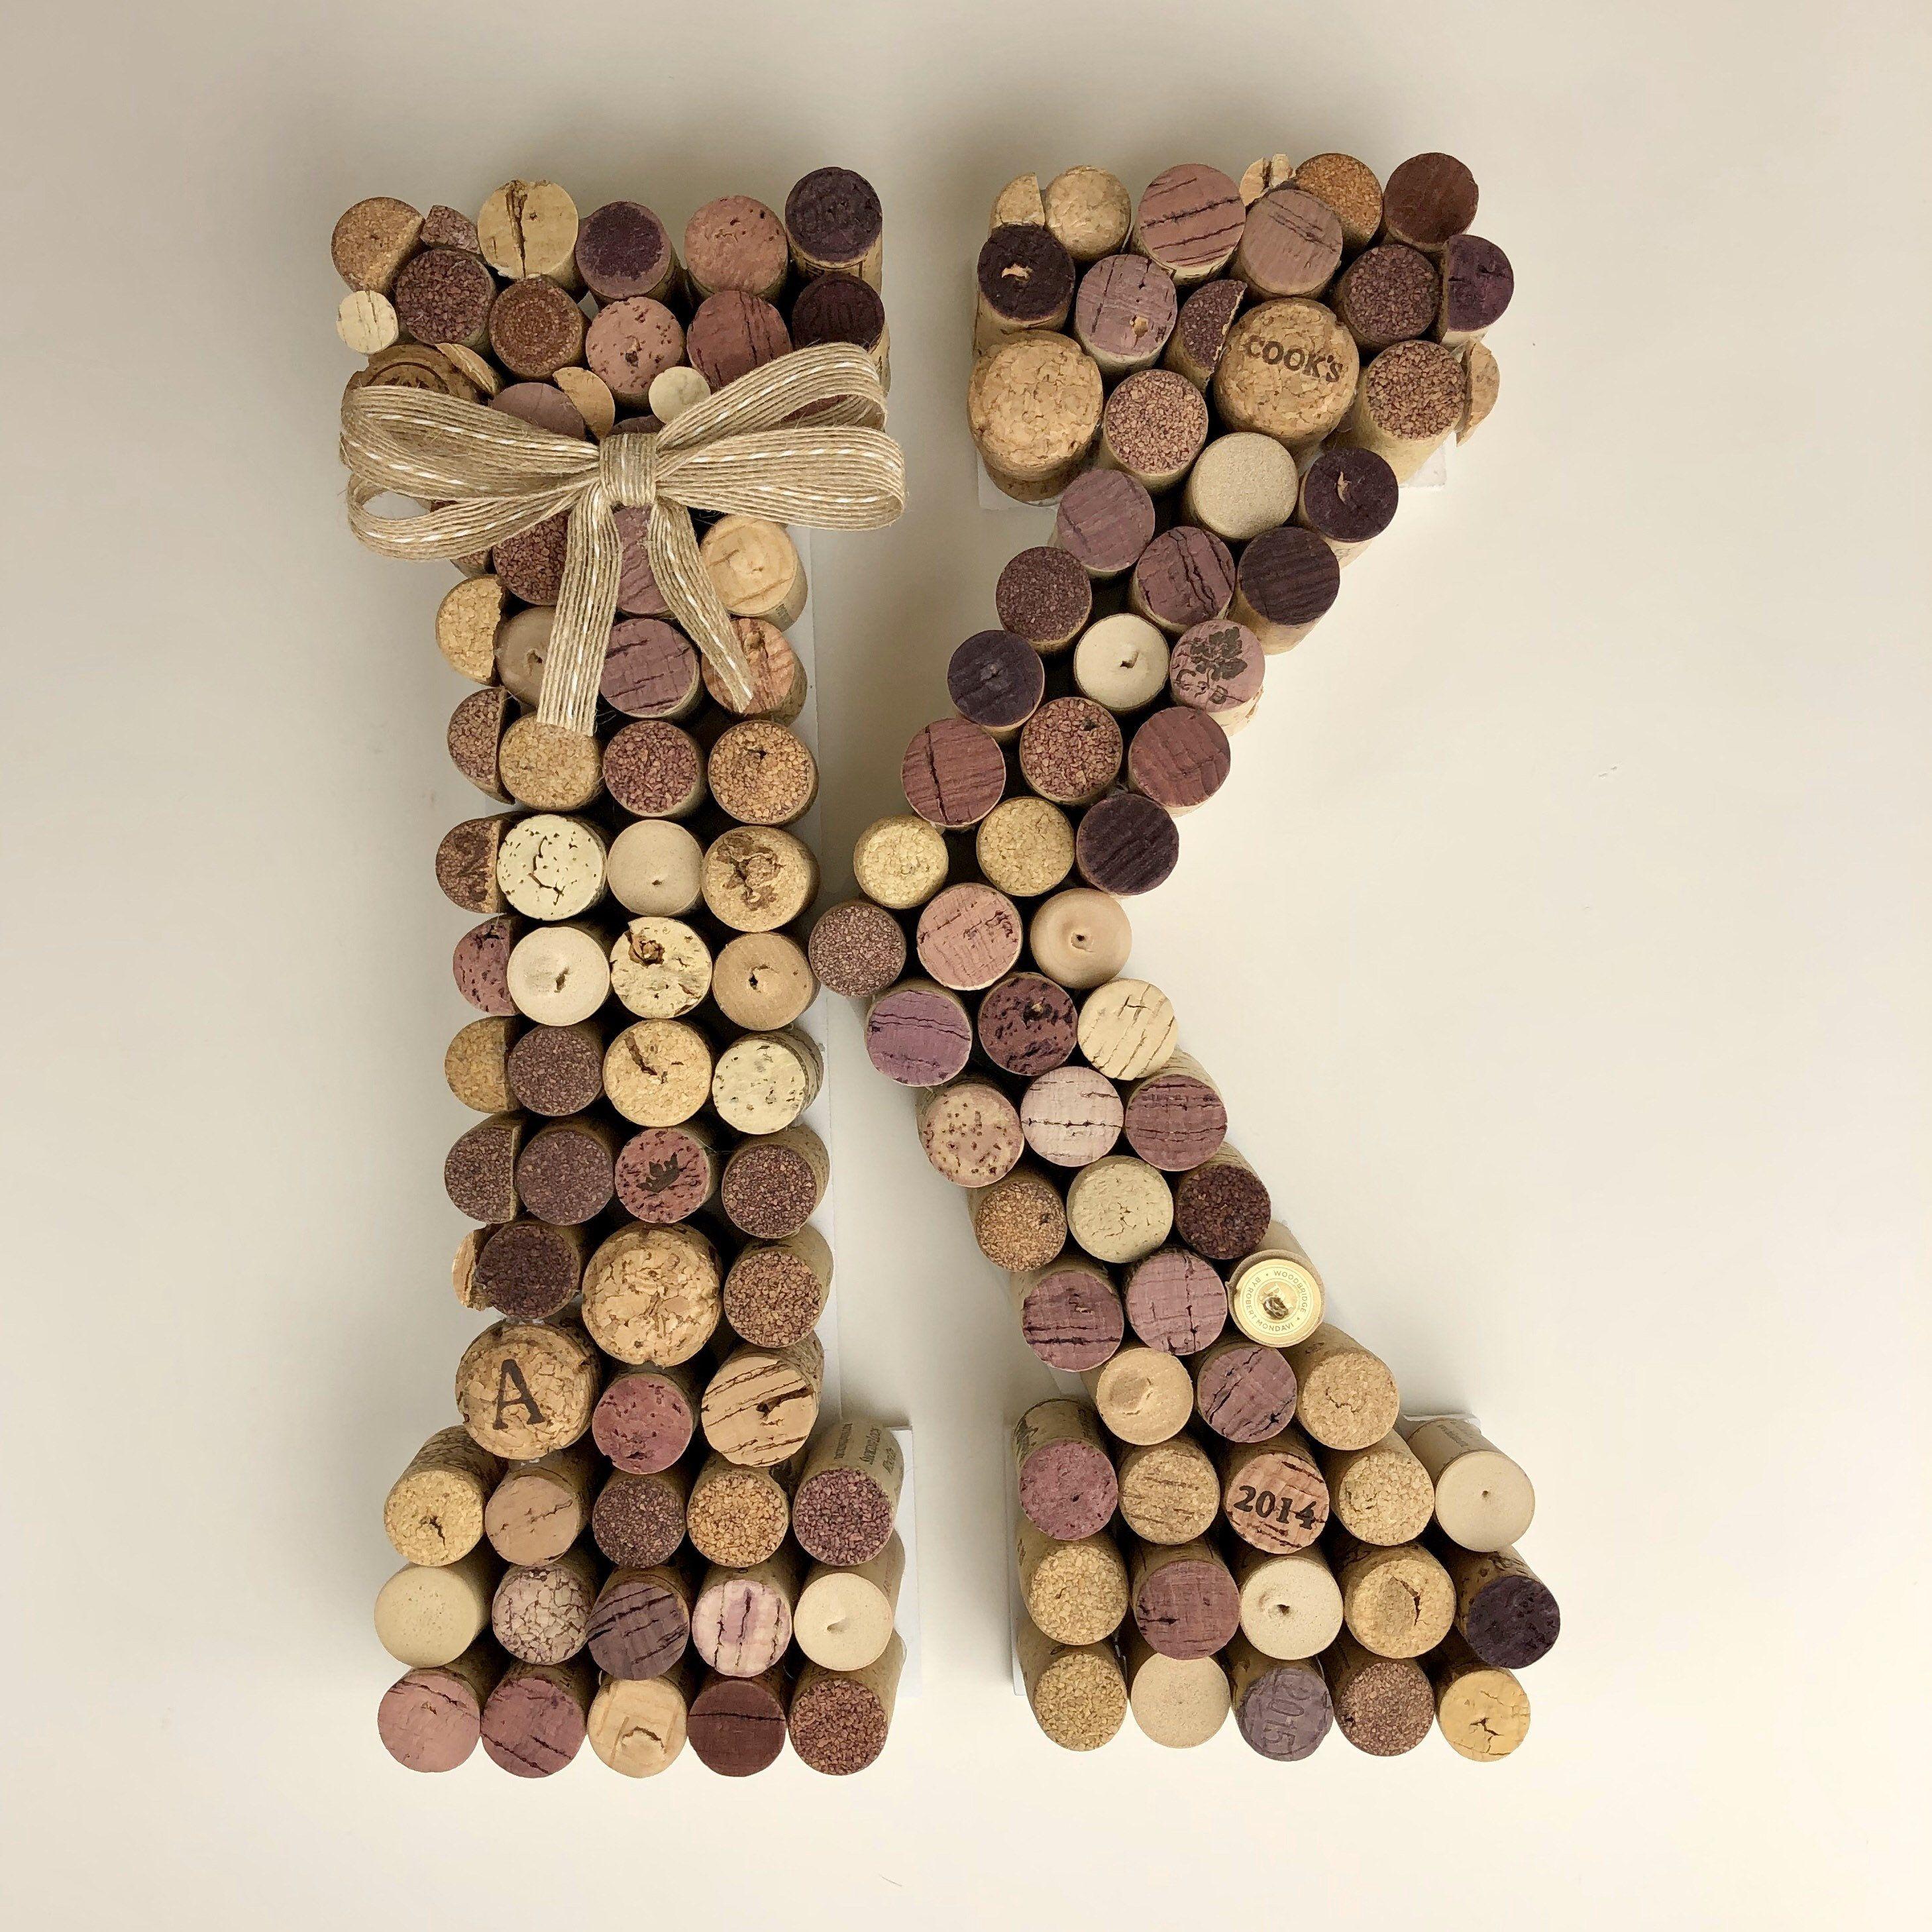 Large Cork Letter B C D E F G H I J K L M N O P Q R S T U V W X Y Z Wine Cork Decor Memo